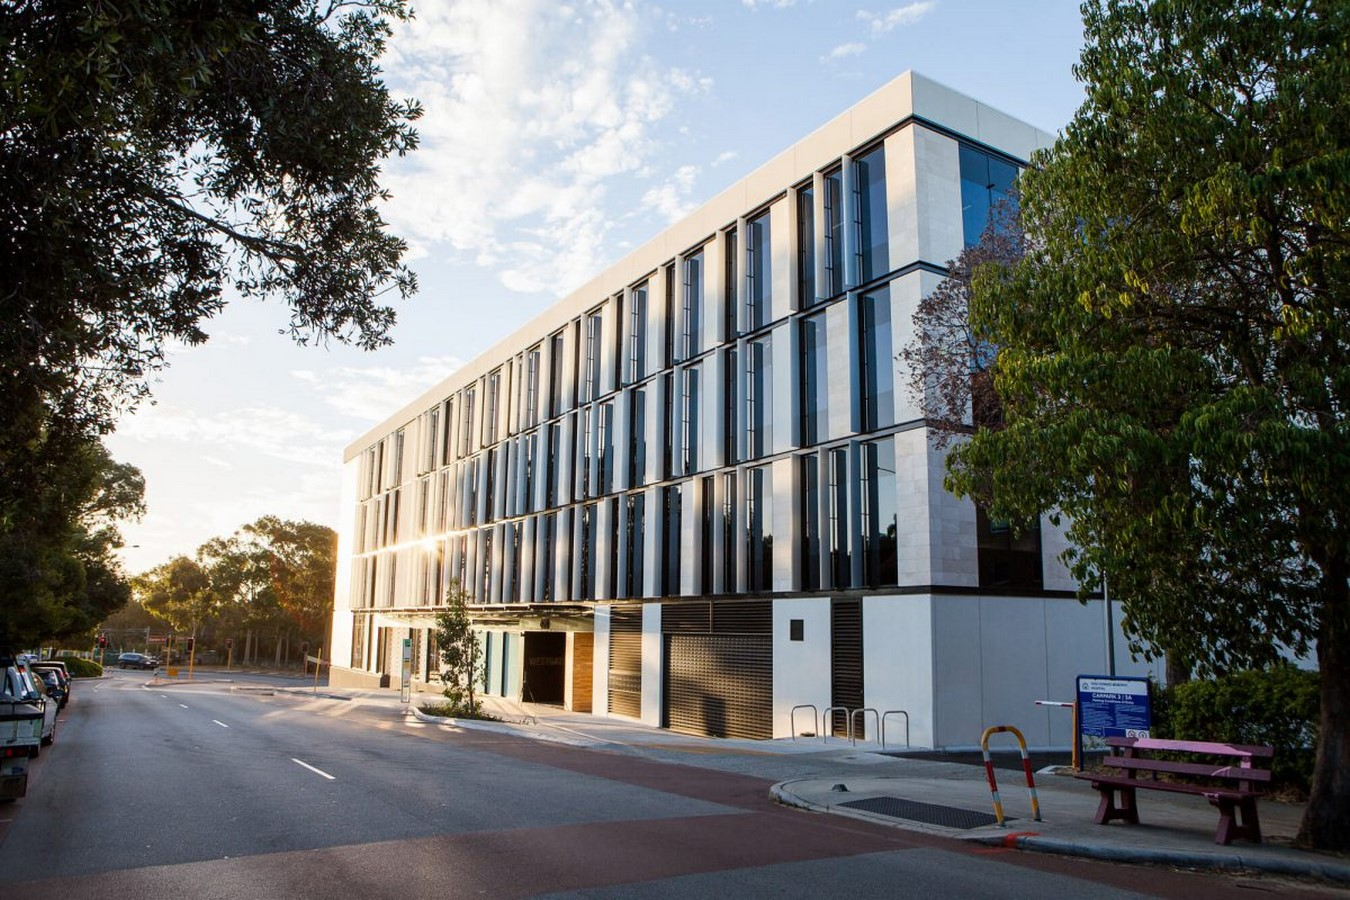 Westgate, Subiaco, Western Australia - Sheet1